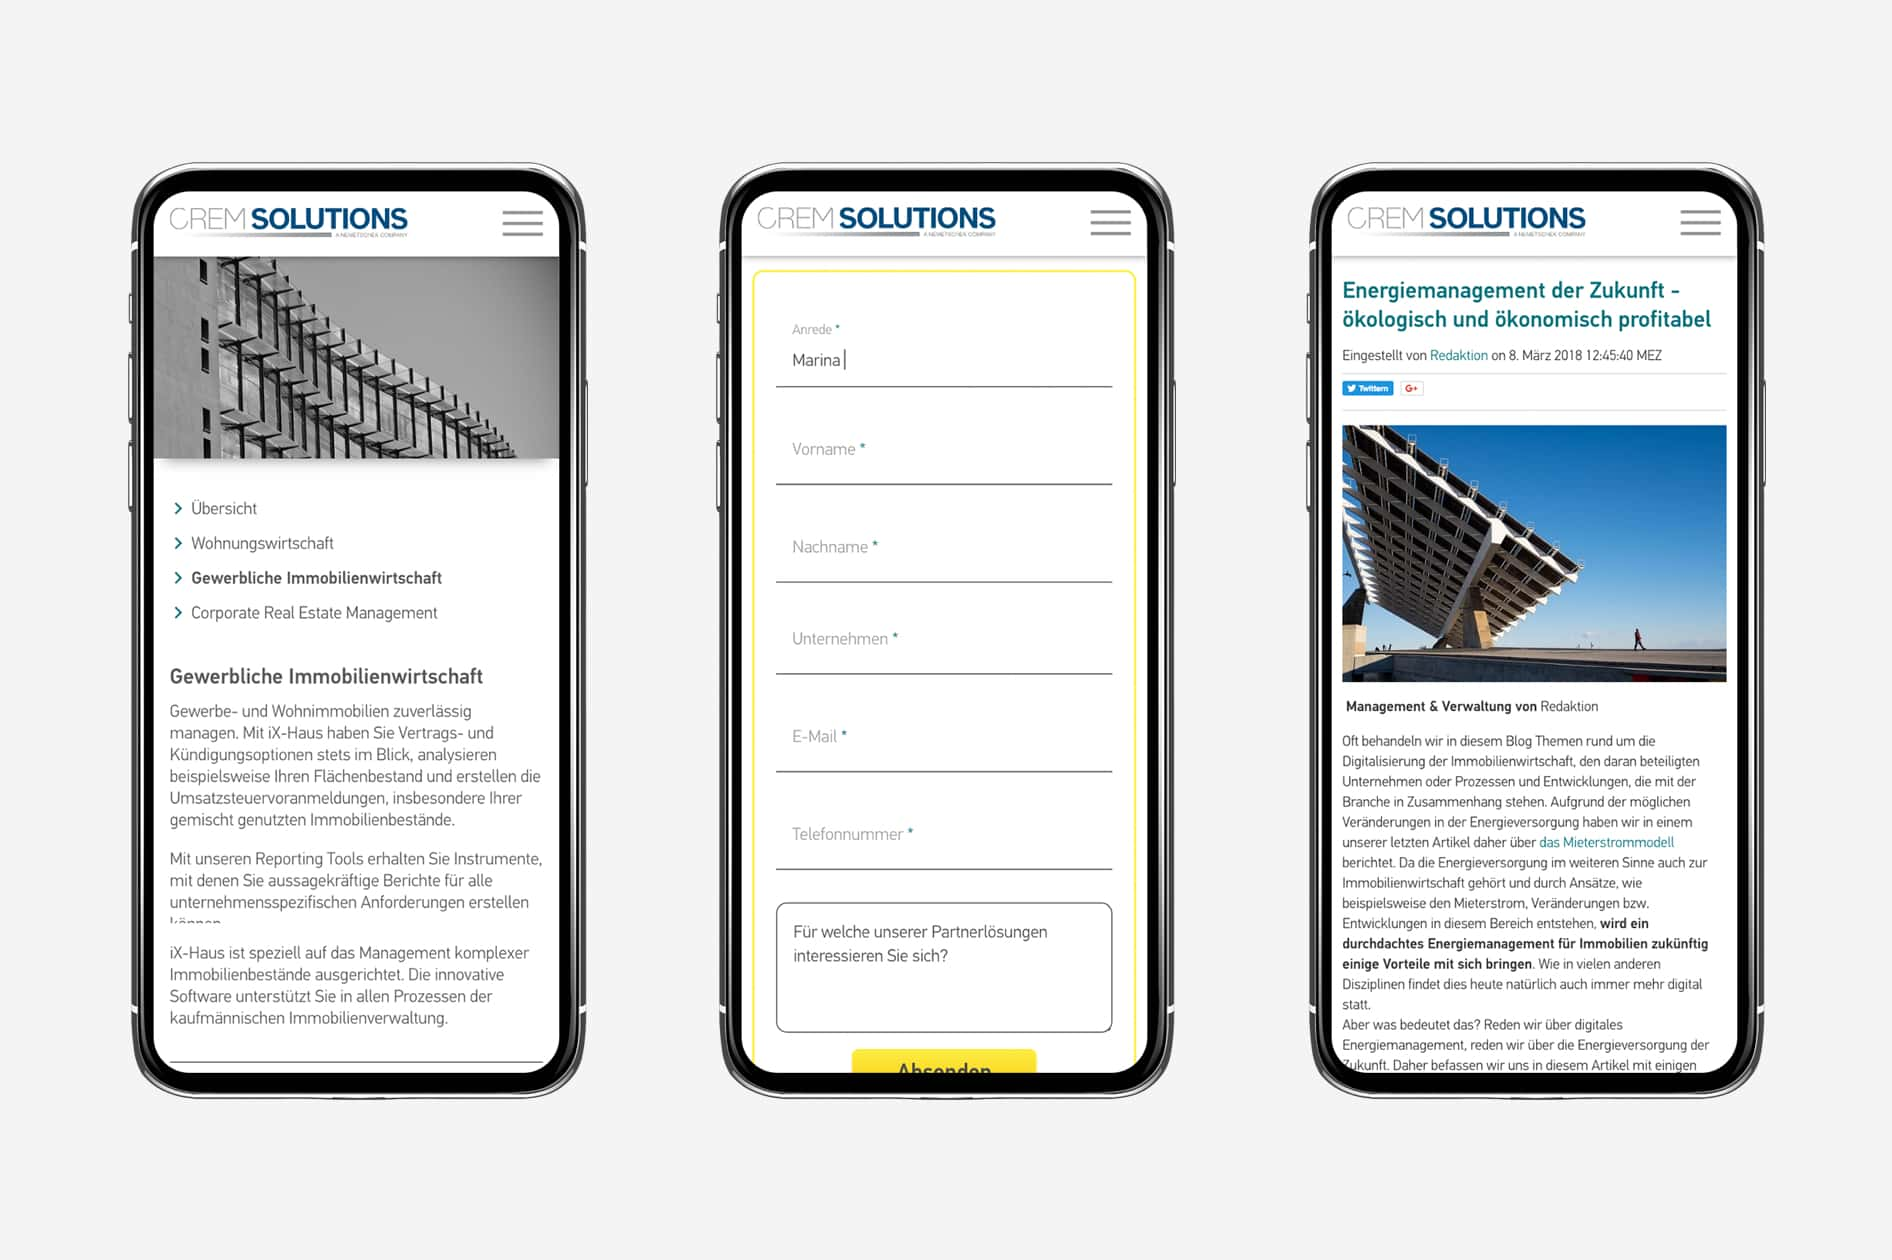 Crem Solutions (Smartphone)